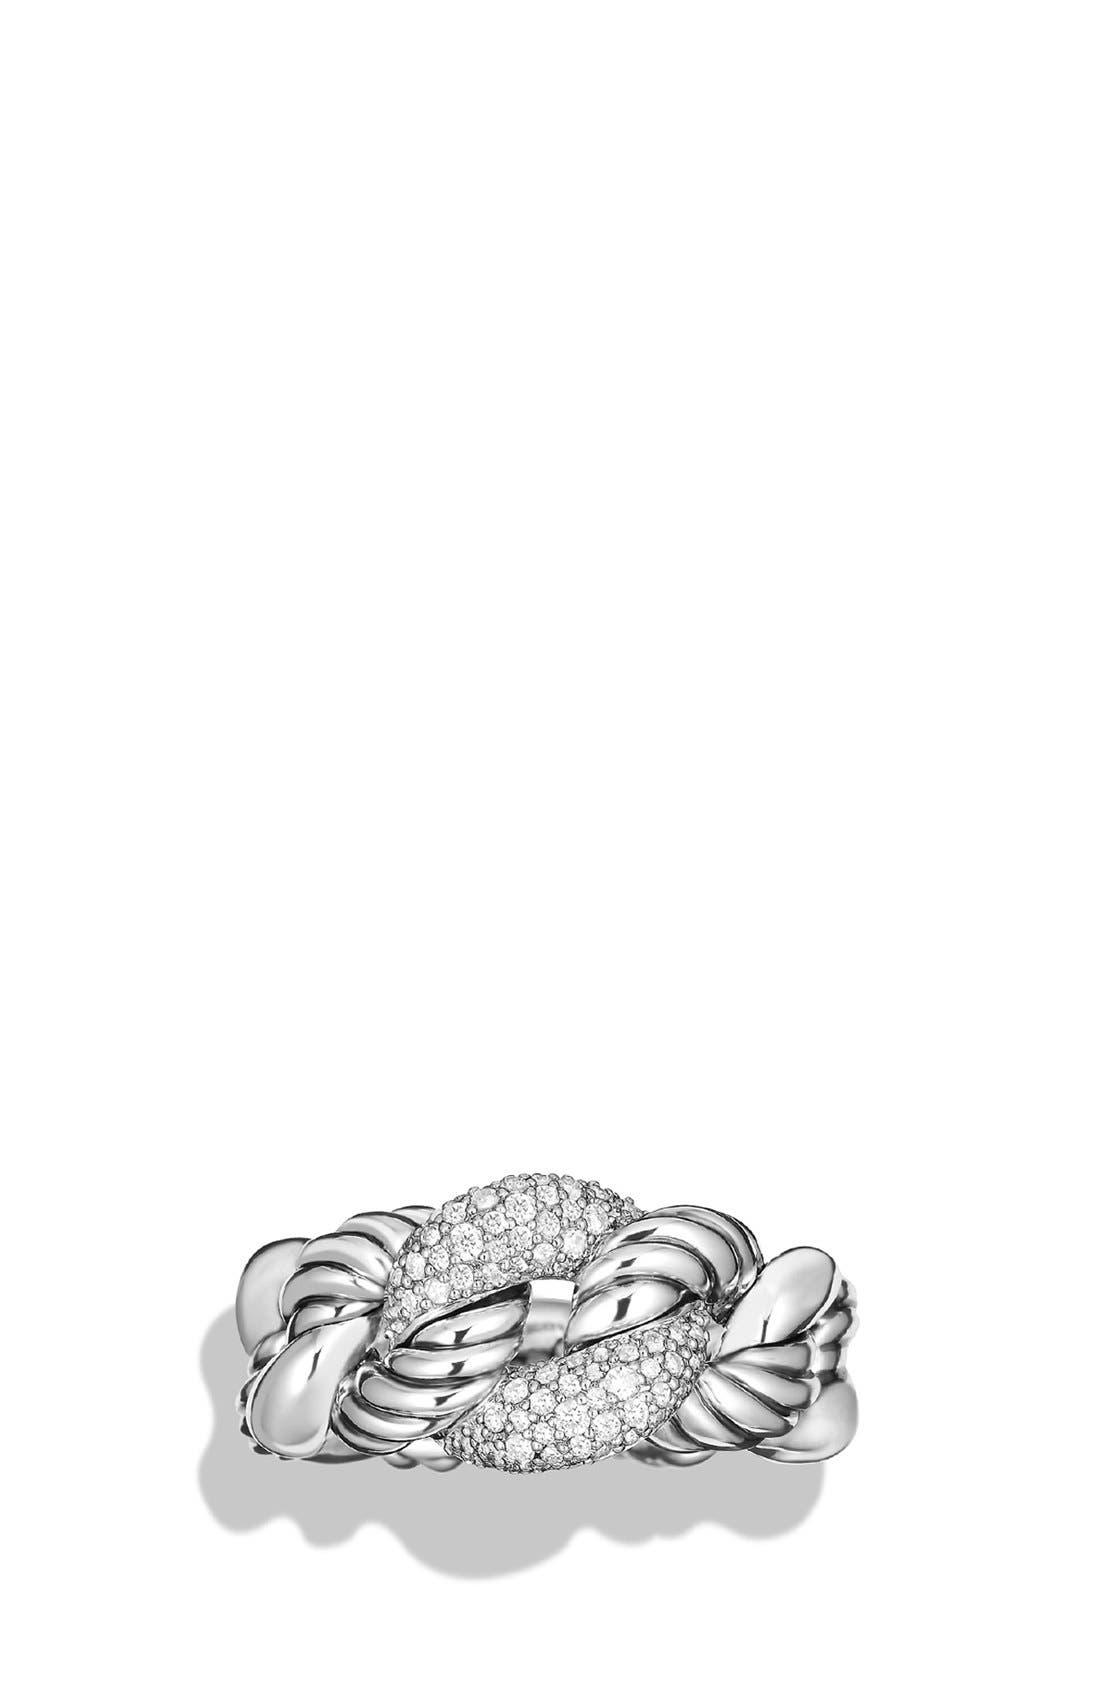 Alternate Image 2  - David Yurman'Belmont' Curb Link Ring with Diamonds